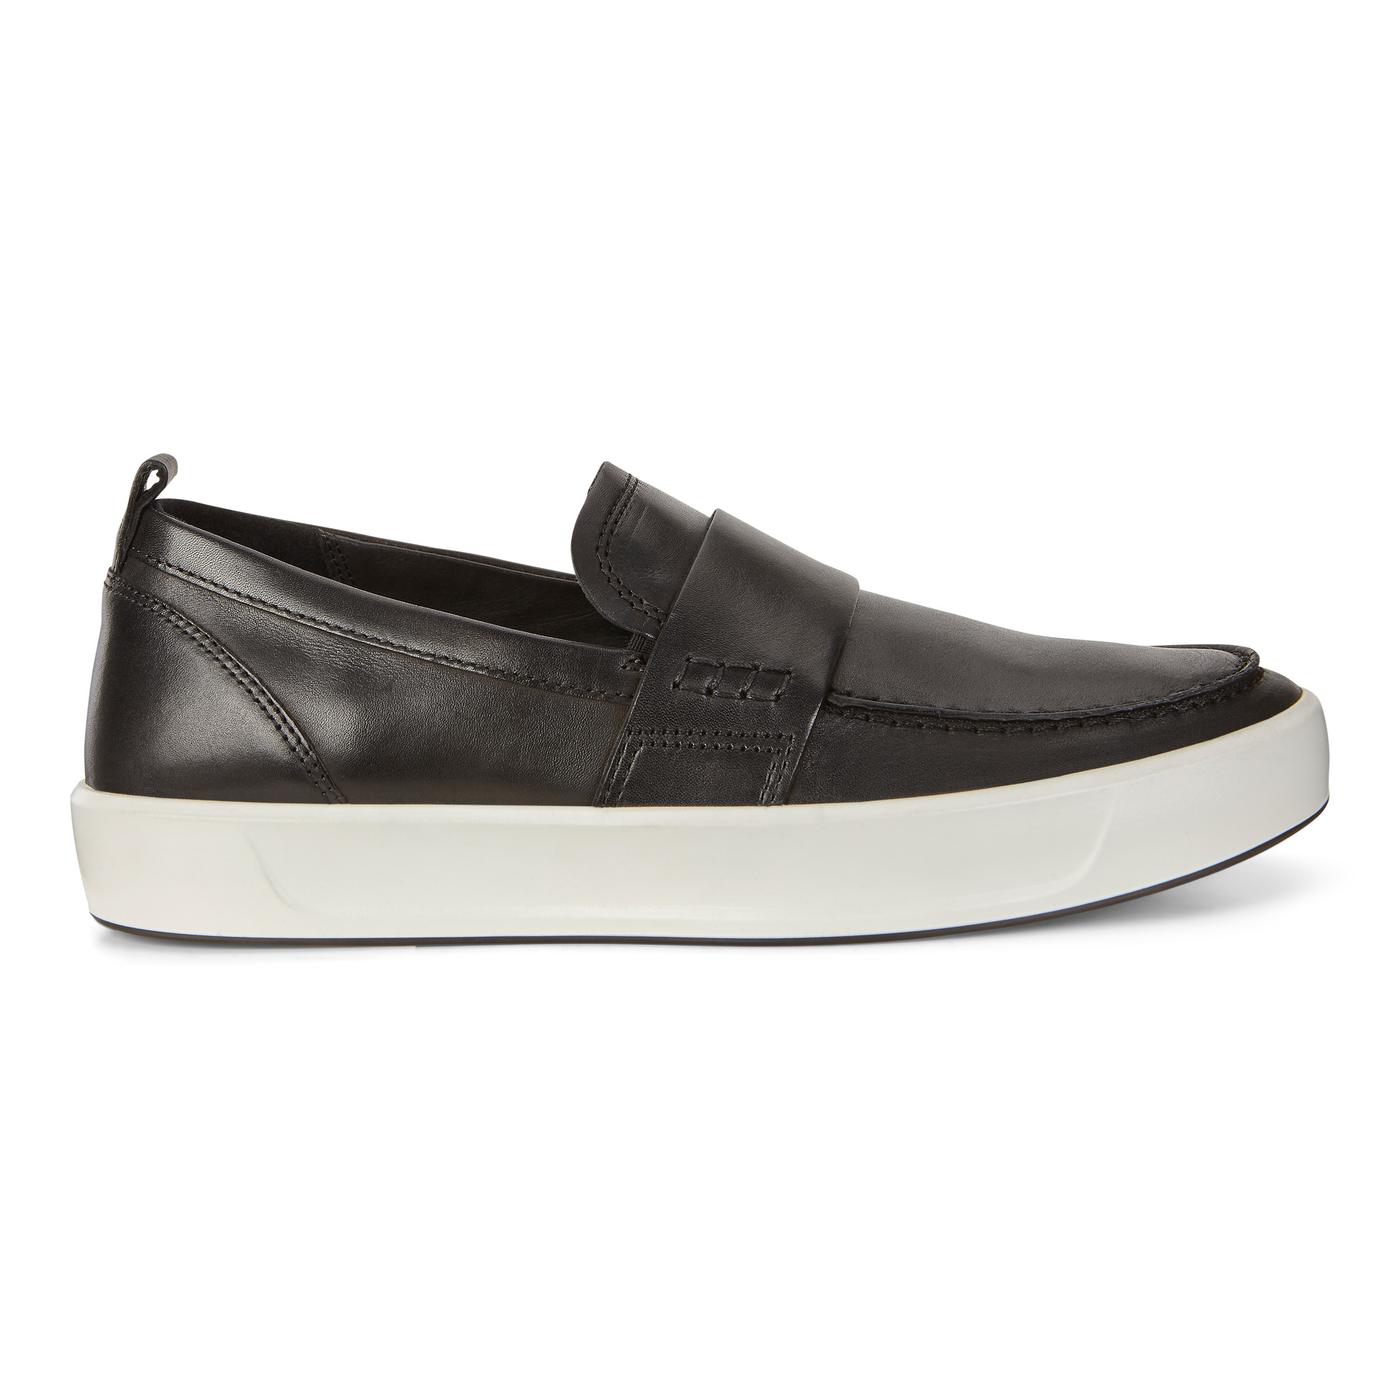 ECCO Mens Soft 8 Loafer